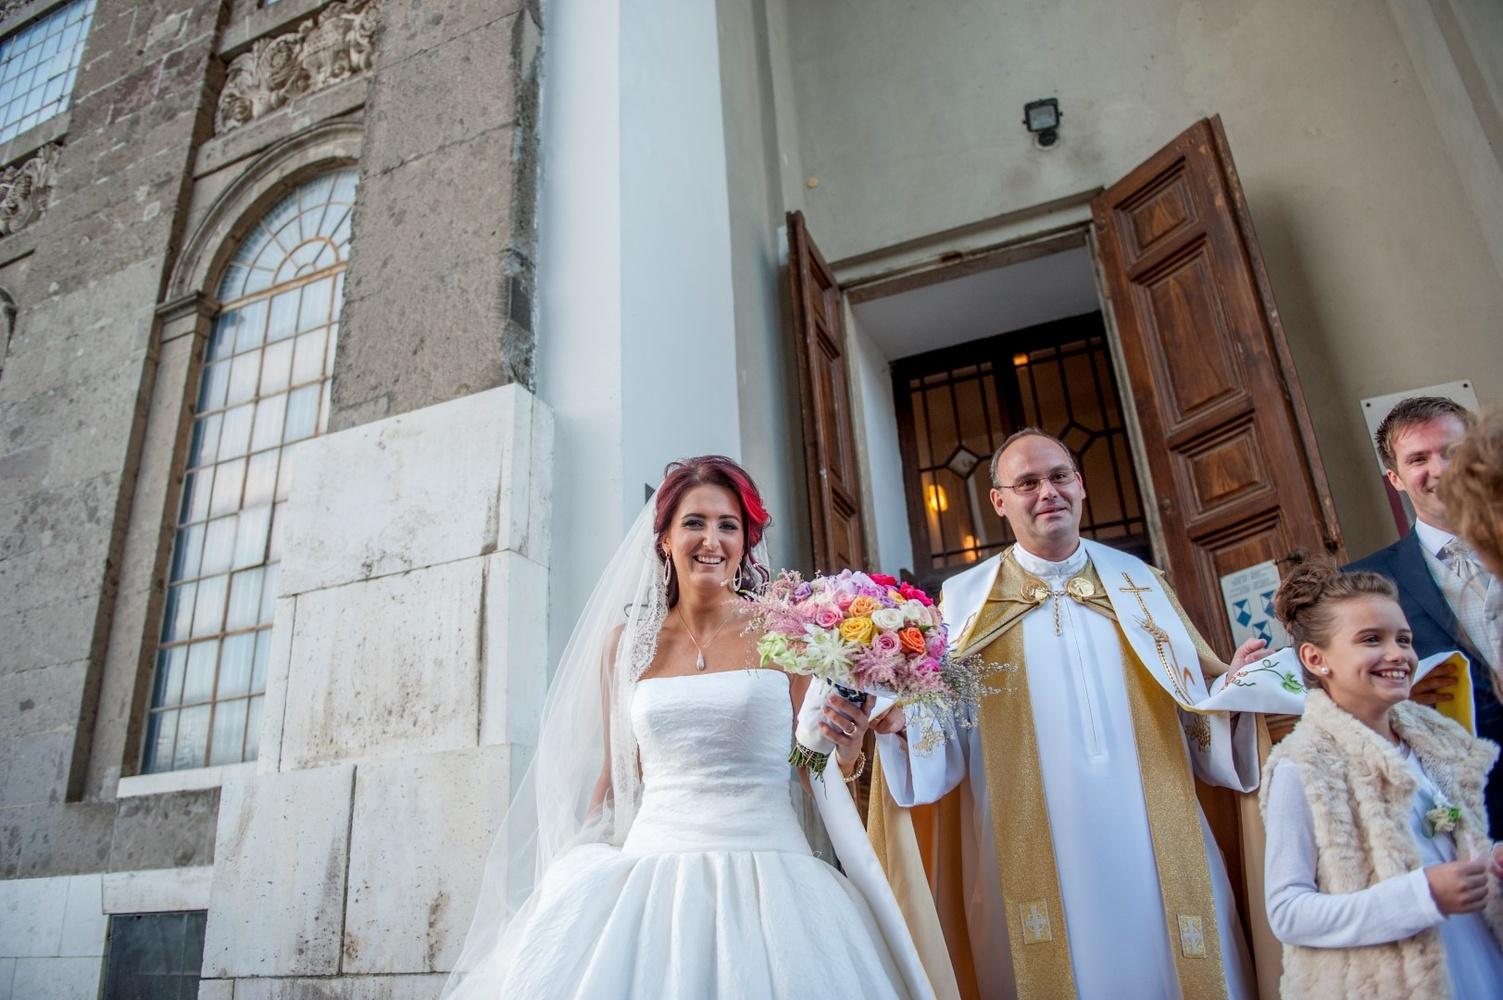 http://www.fotoz.sk/images/gallery-12/normal/svadba_hotel-chateau-bela_095.jpg